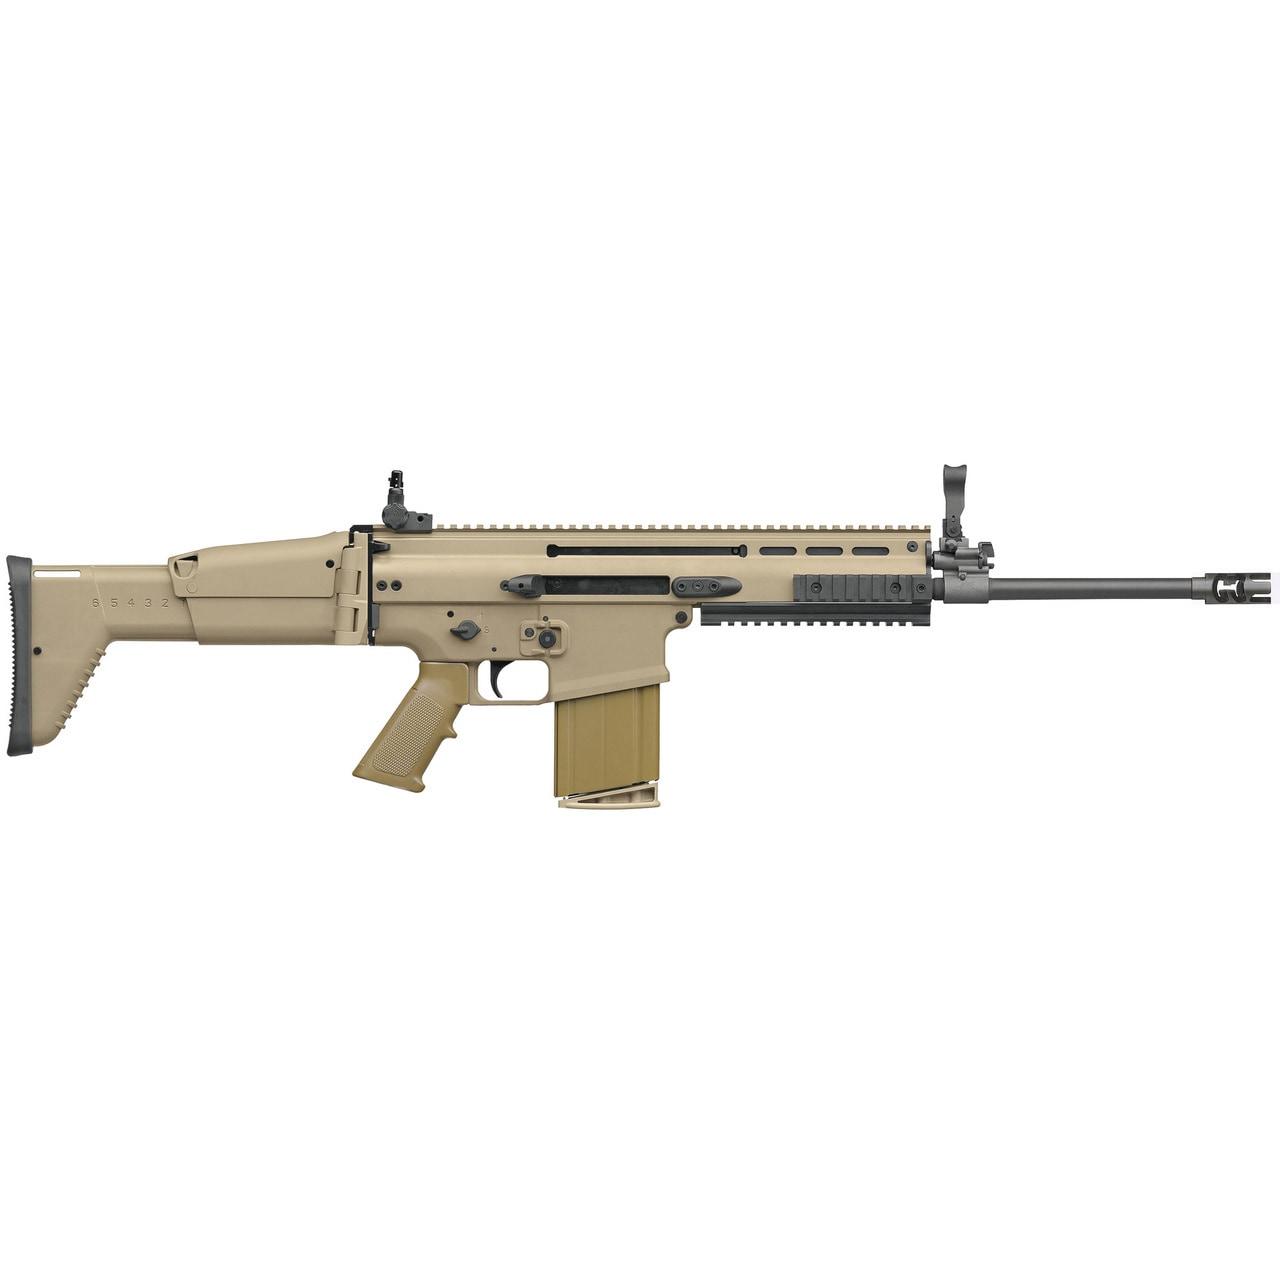 FN AMERICAN SCAR 17S